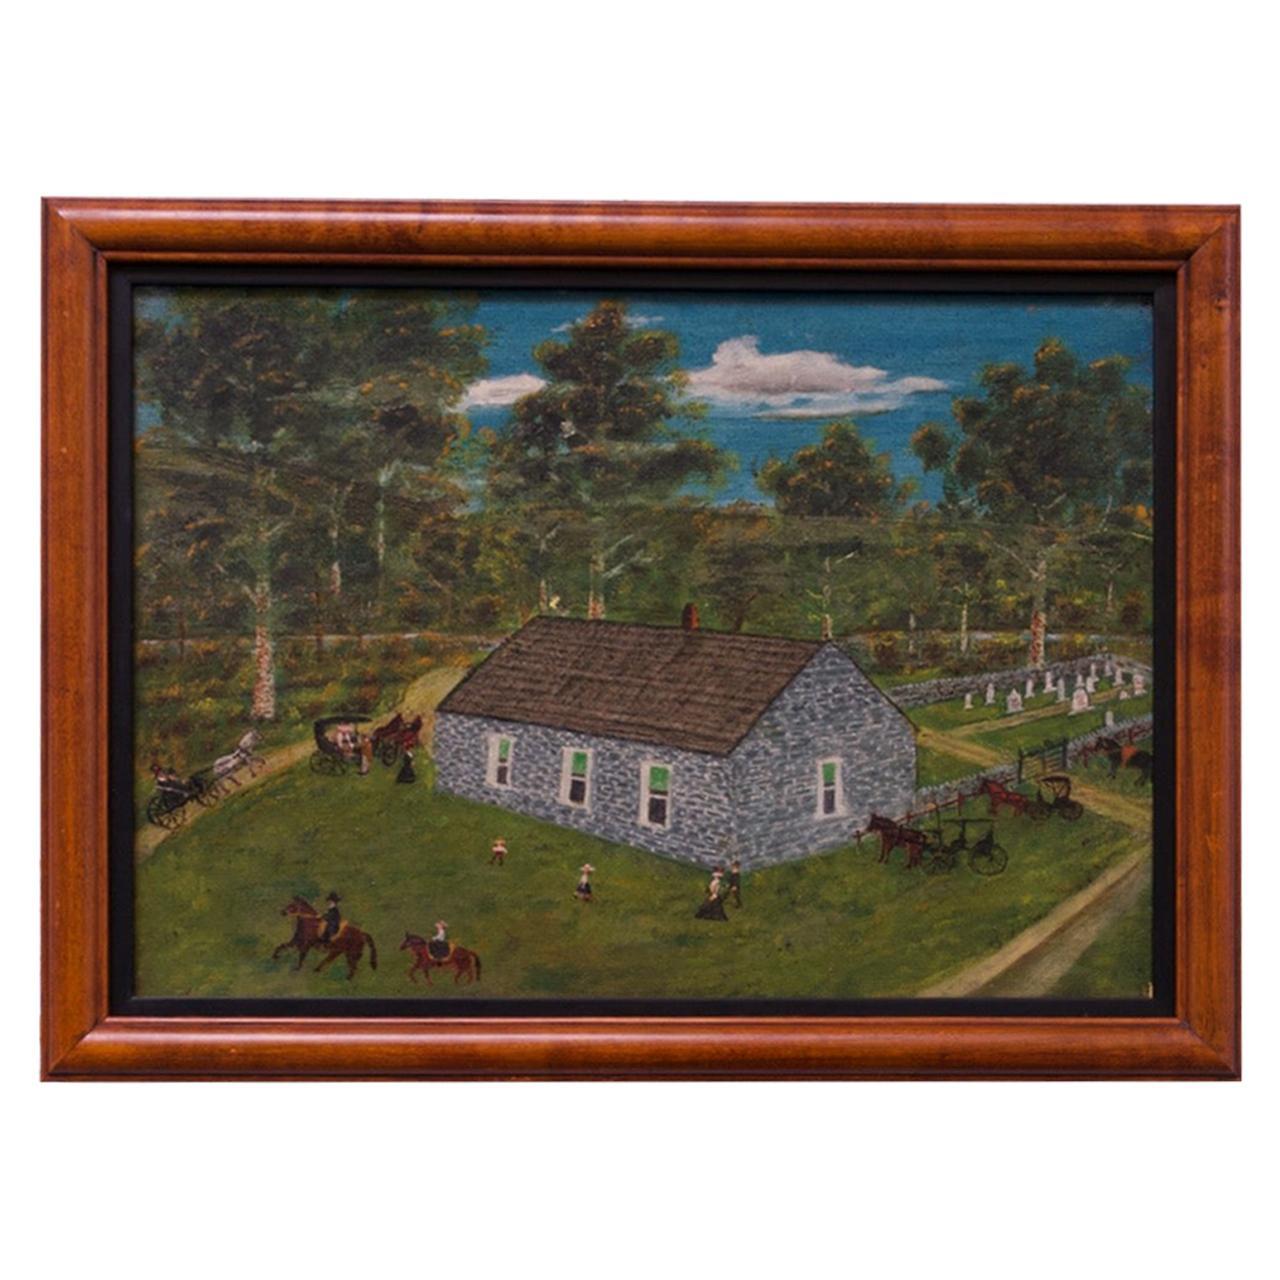 Harvey Milligan Amish Farmhouse Pastoral Scene Oil on Canvas